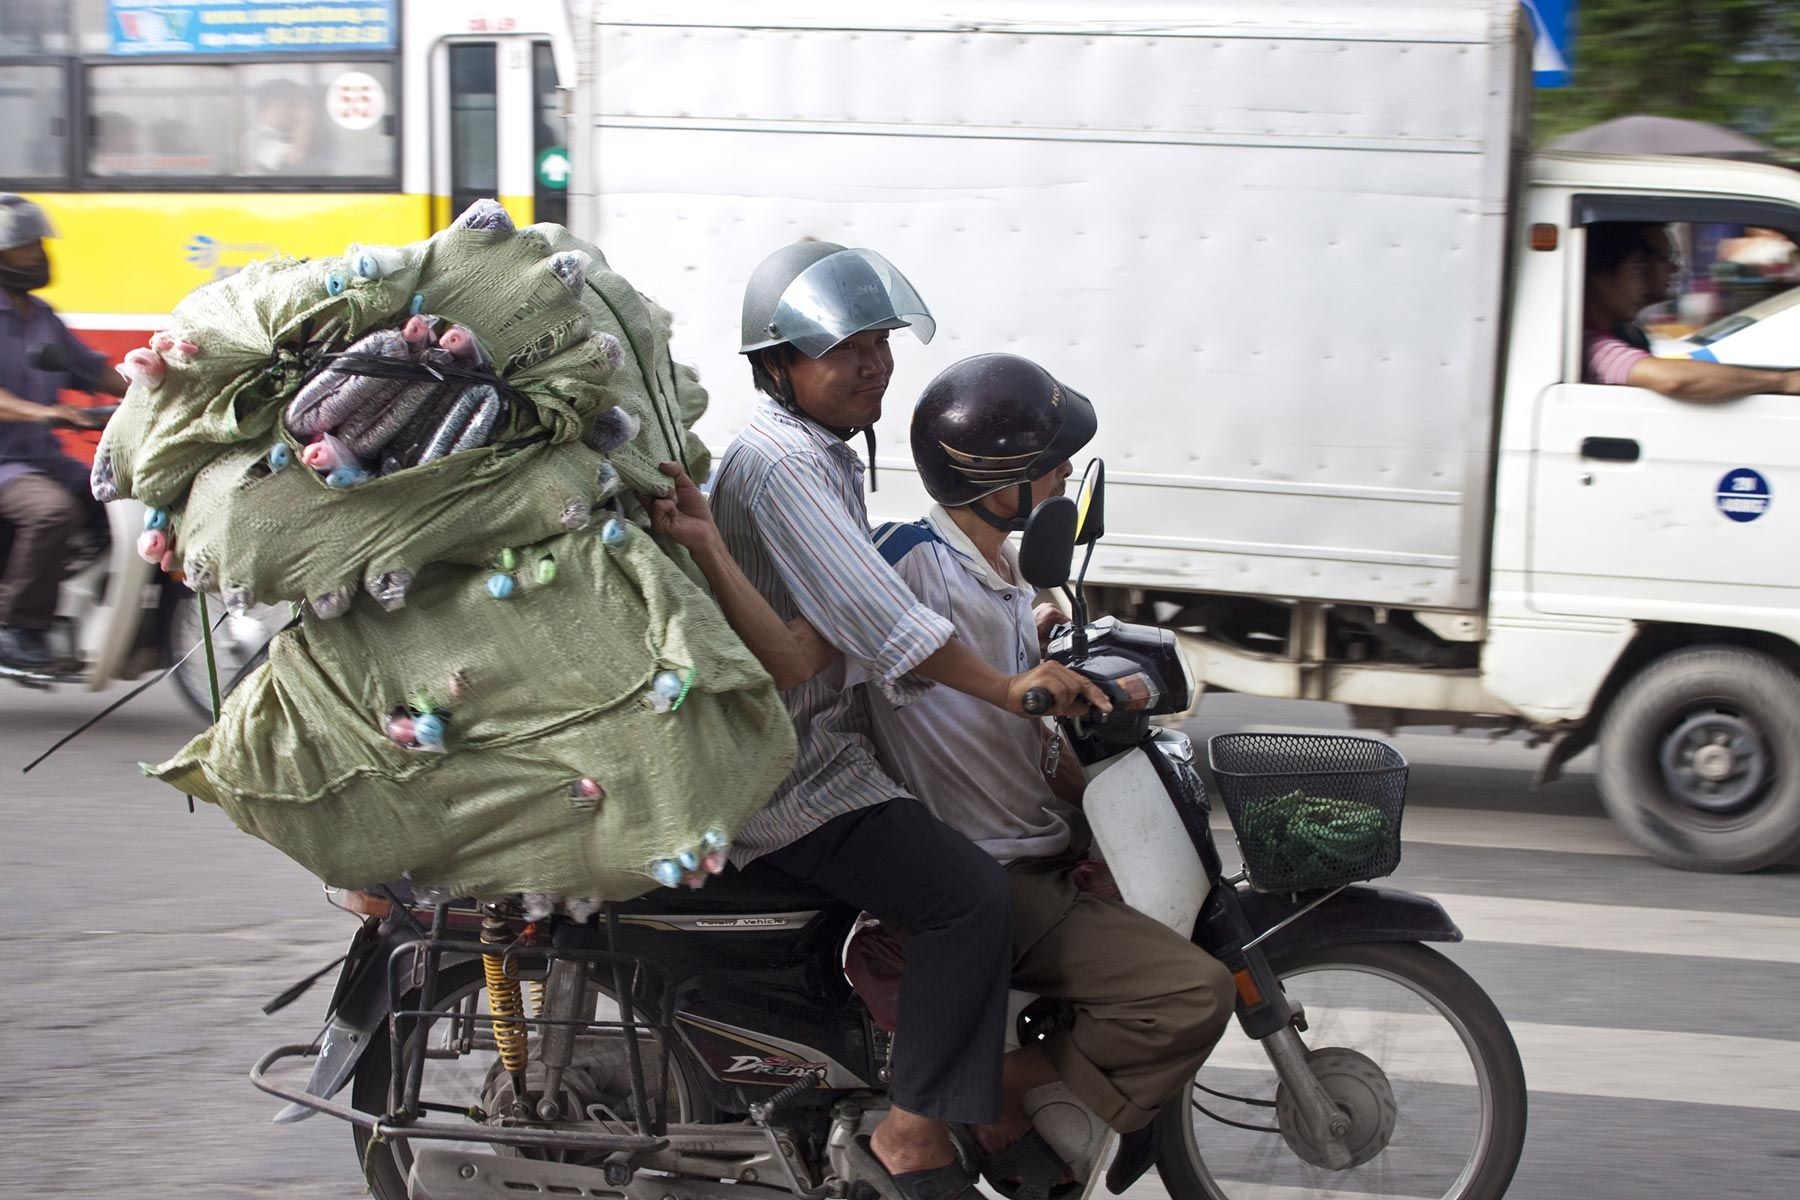 Only in Vietnam.  #hochiminh #saigon #motorbike #unique #vietnam #drivevietnam #airporttransfer